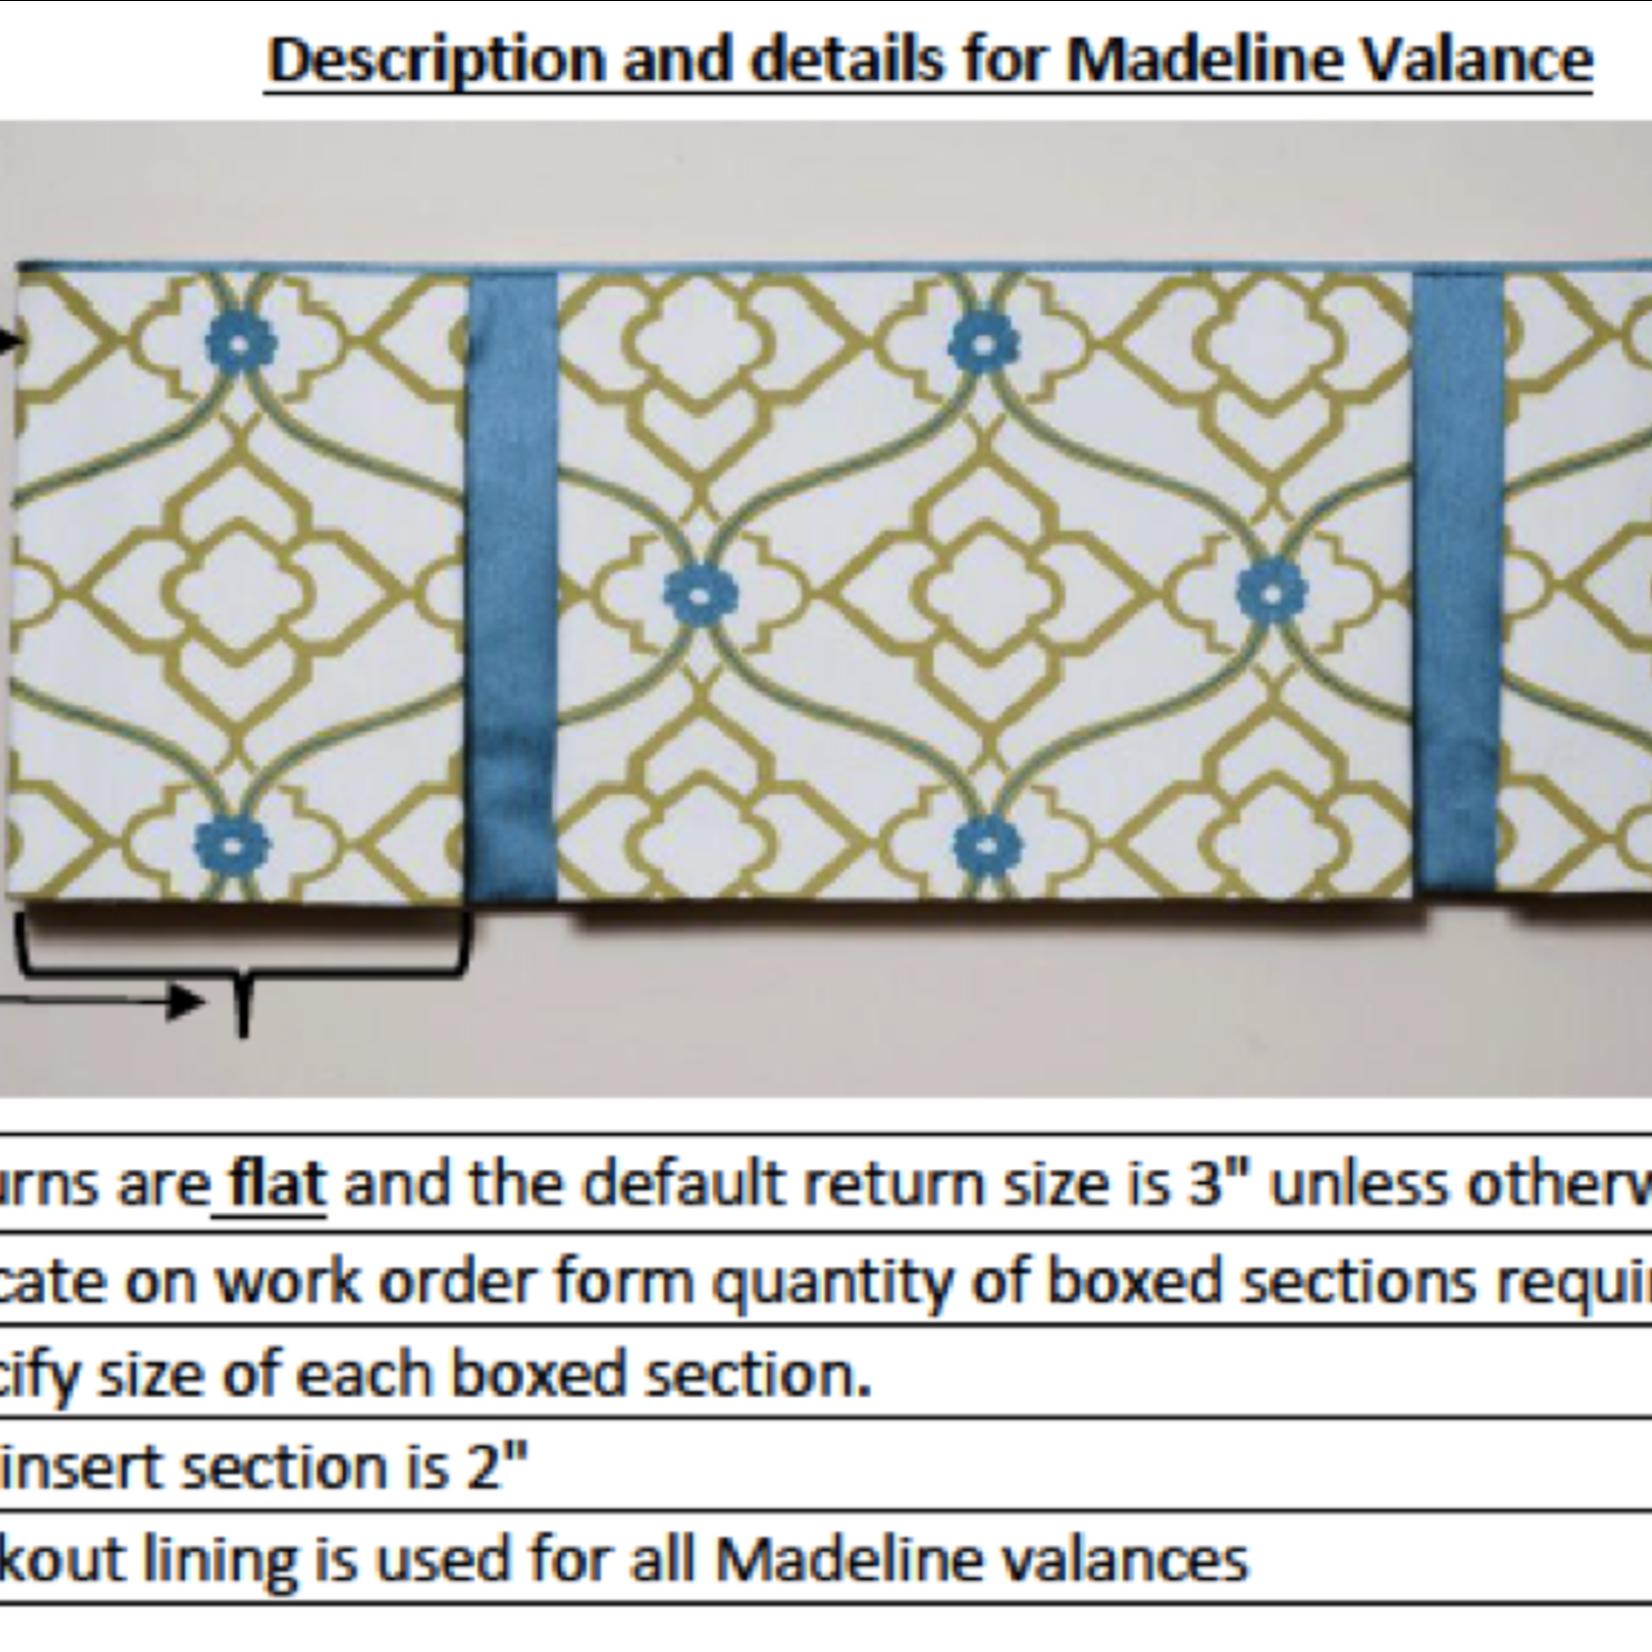 Trendy Drapery - DT Madeline Valance